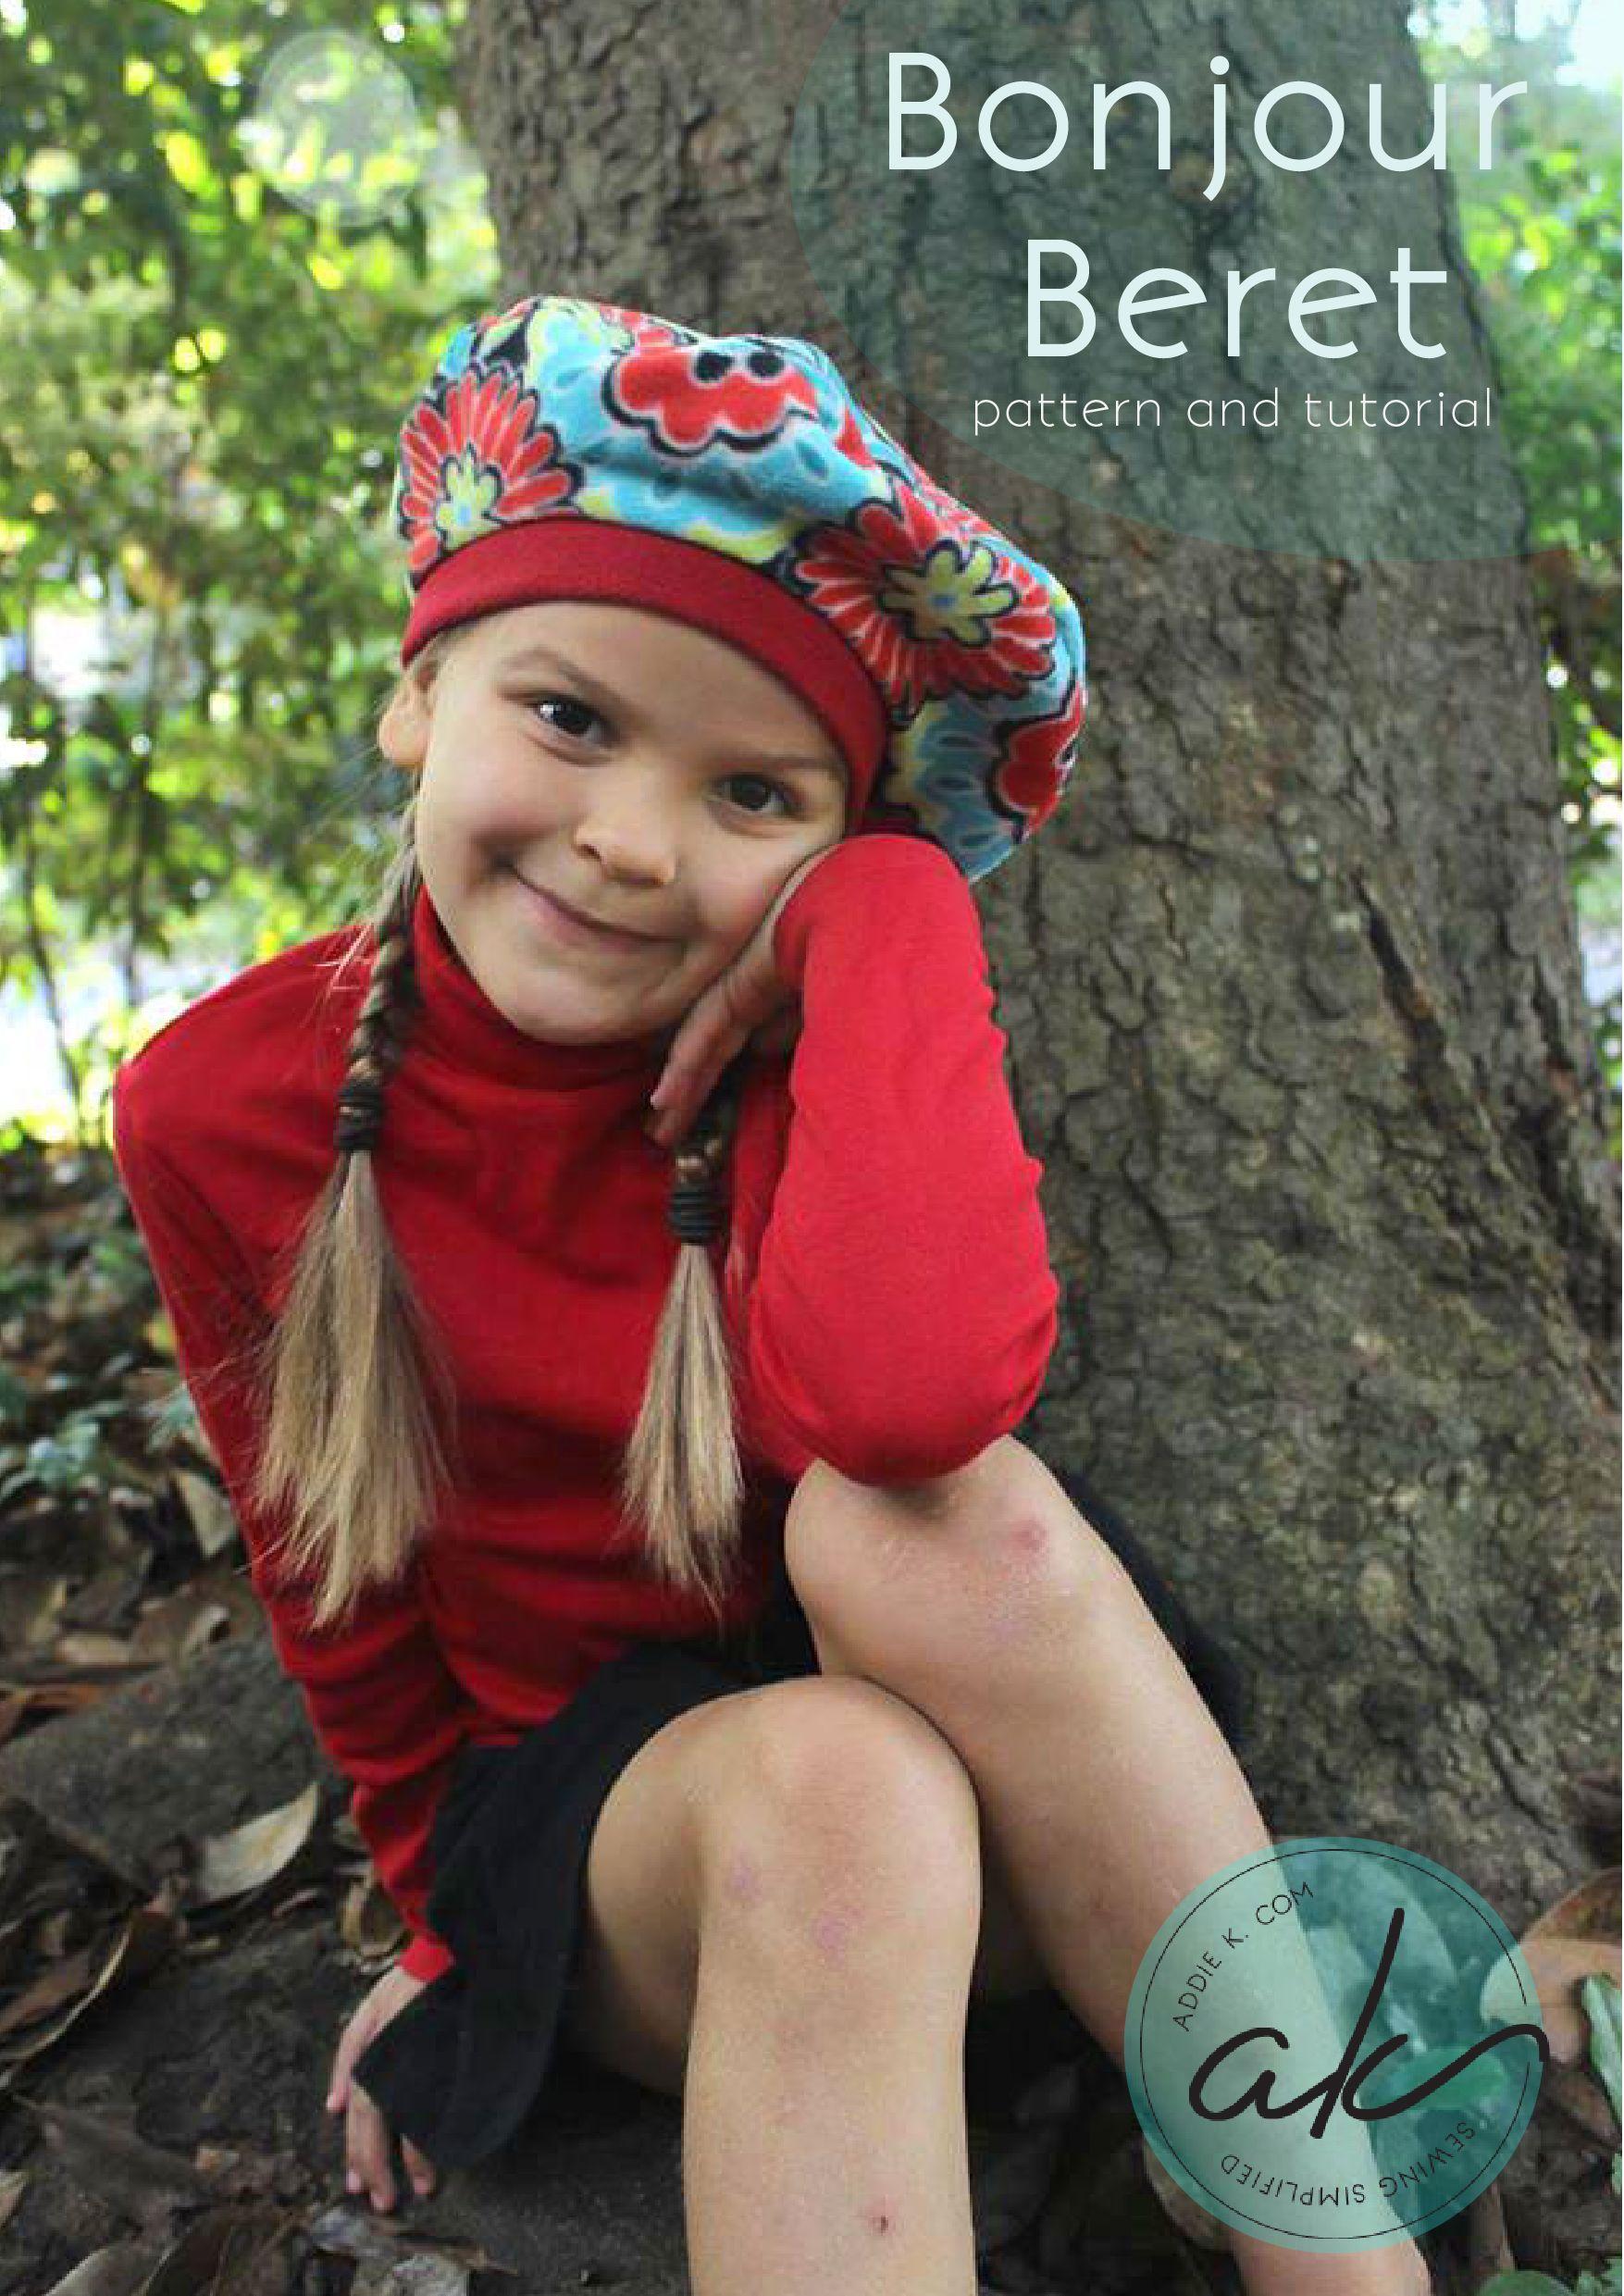 Bonjour Beret Tutorial by Addiek.com | Quilting & Textiles ...